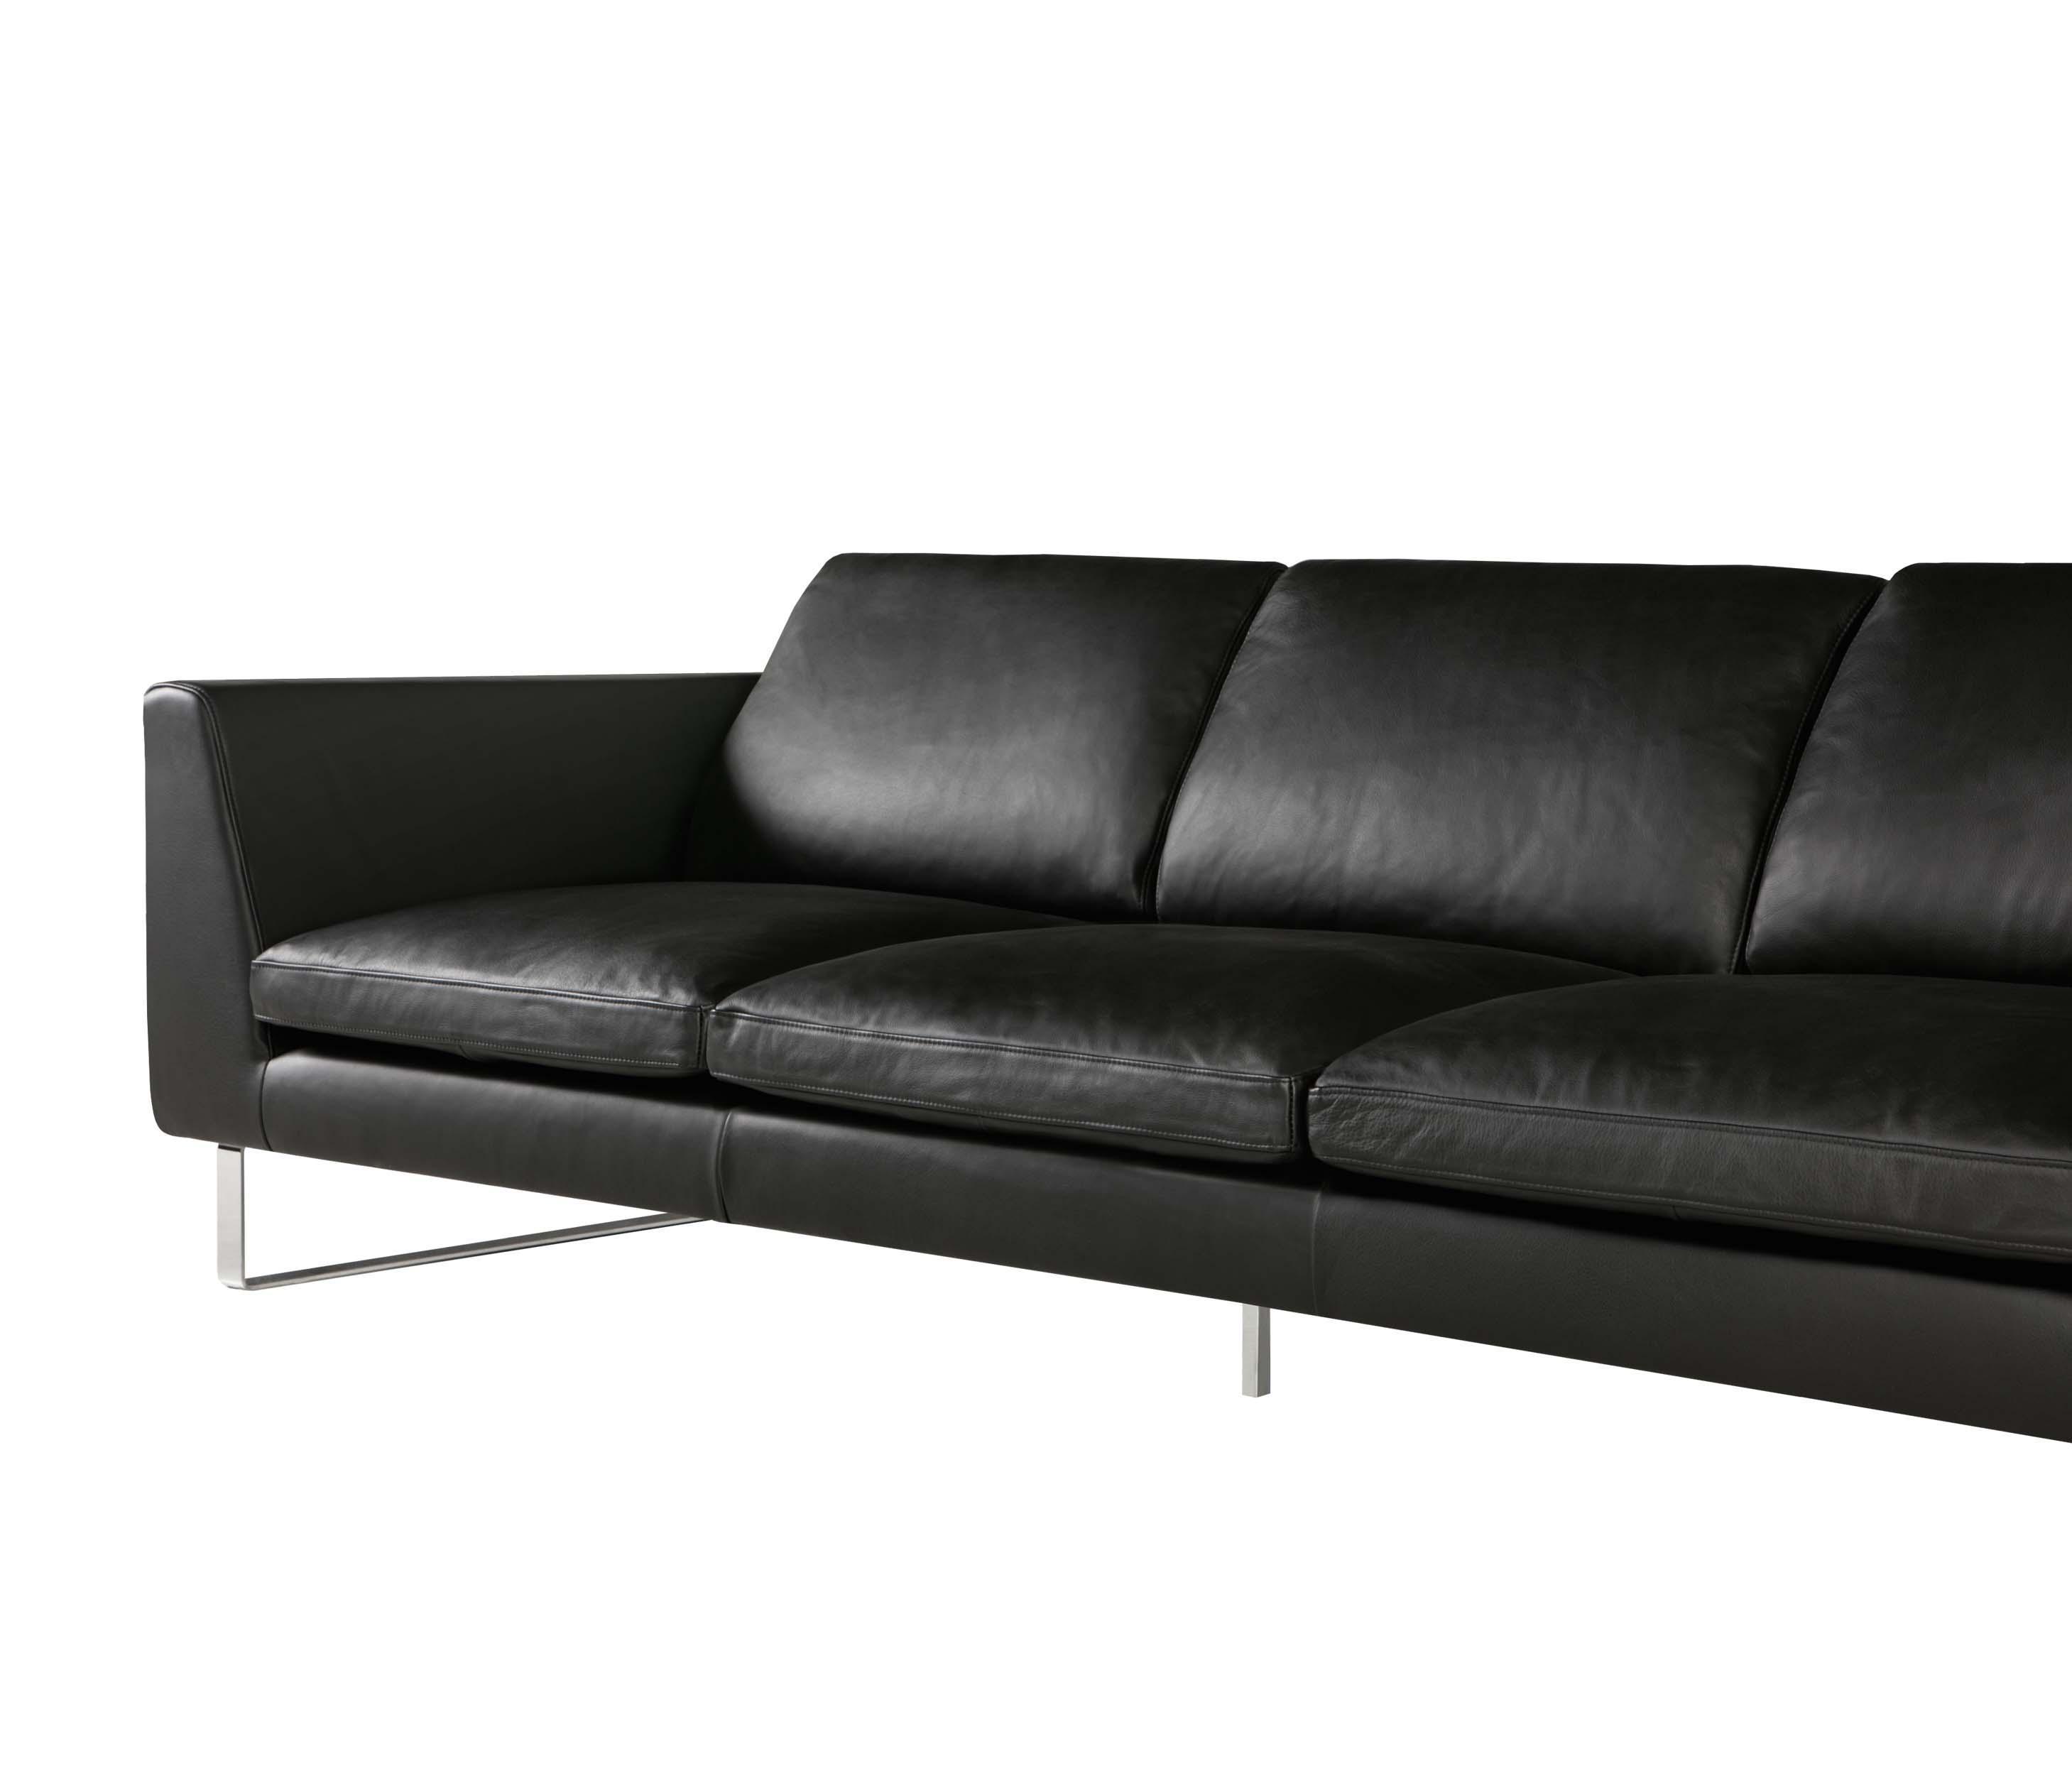 tokyo loungesofas von sits architonic. Black Bedroom Furniture Sets. Home Design Ideas